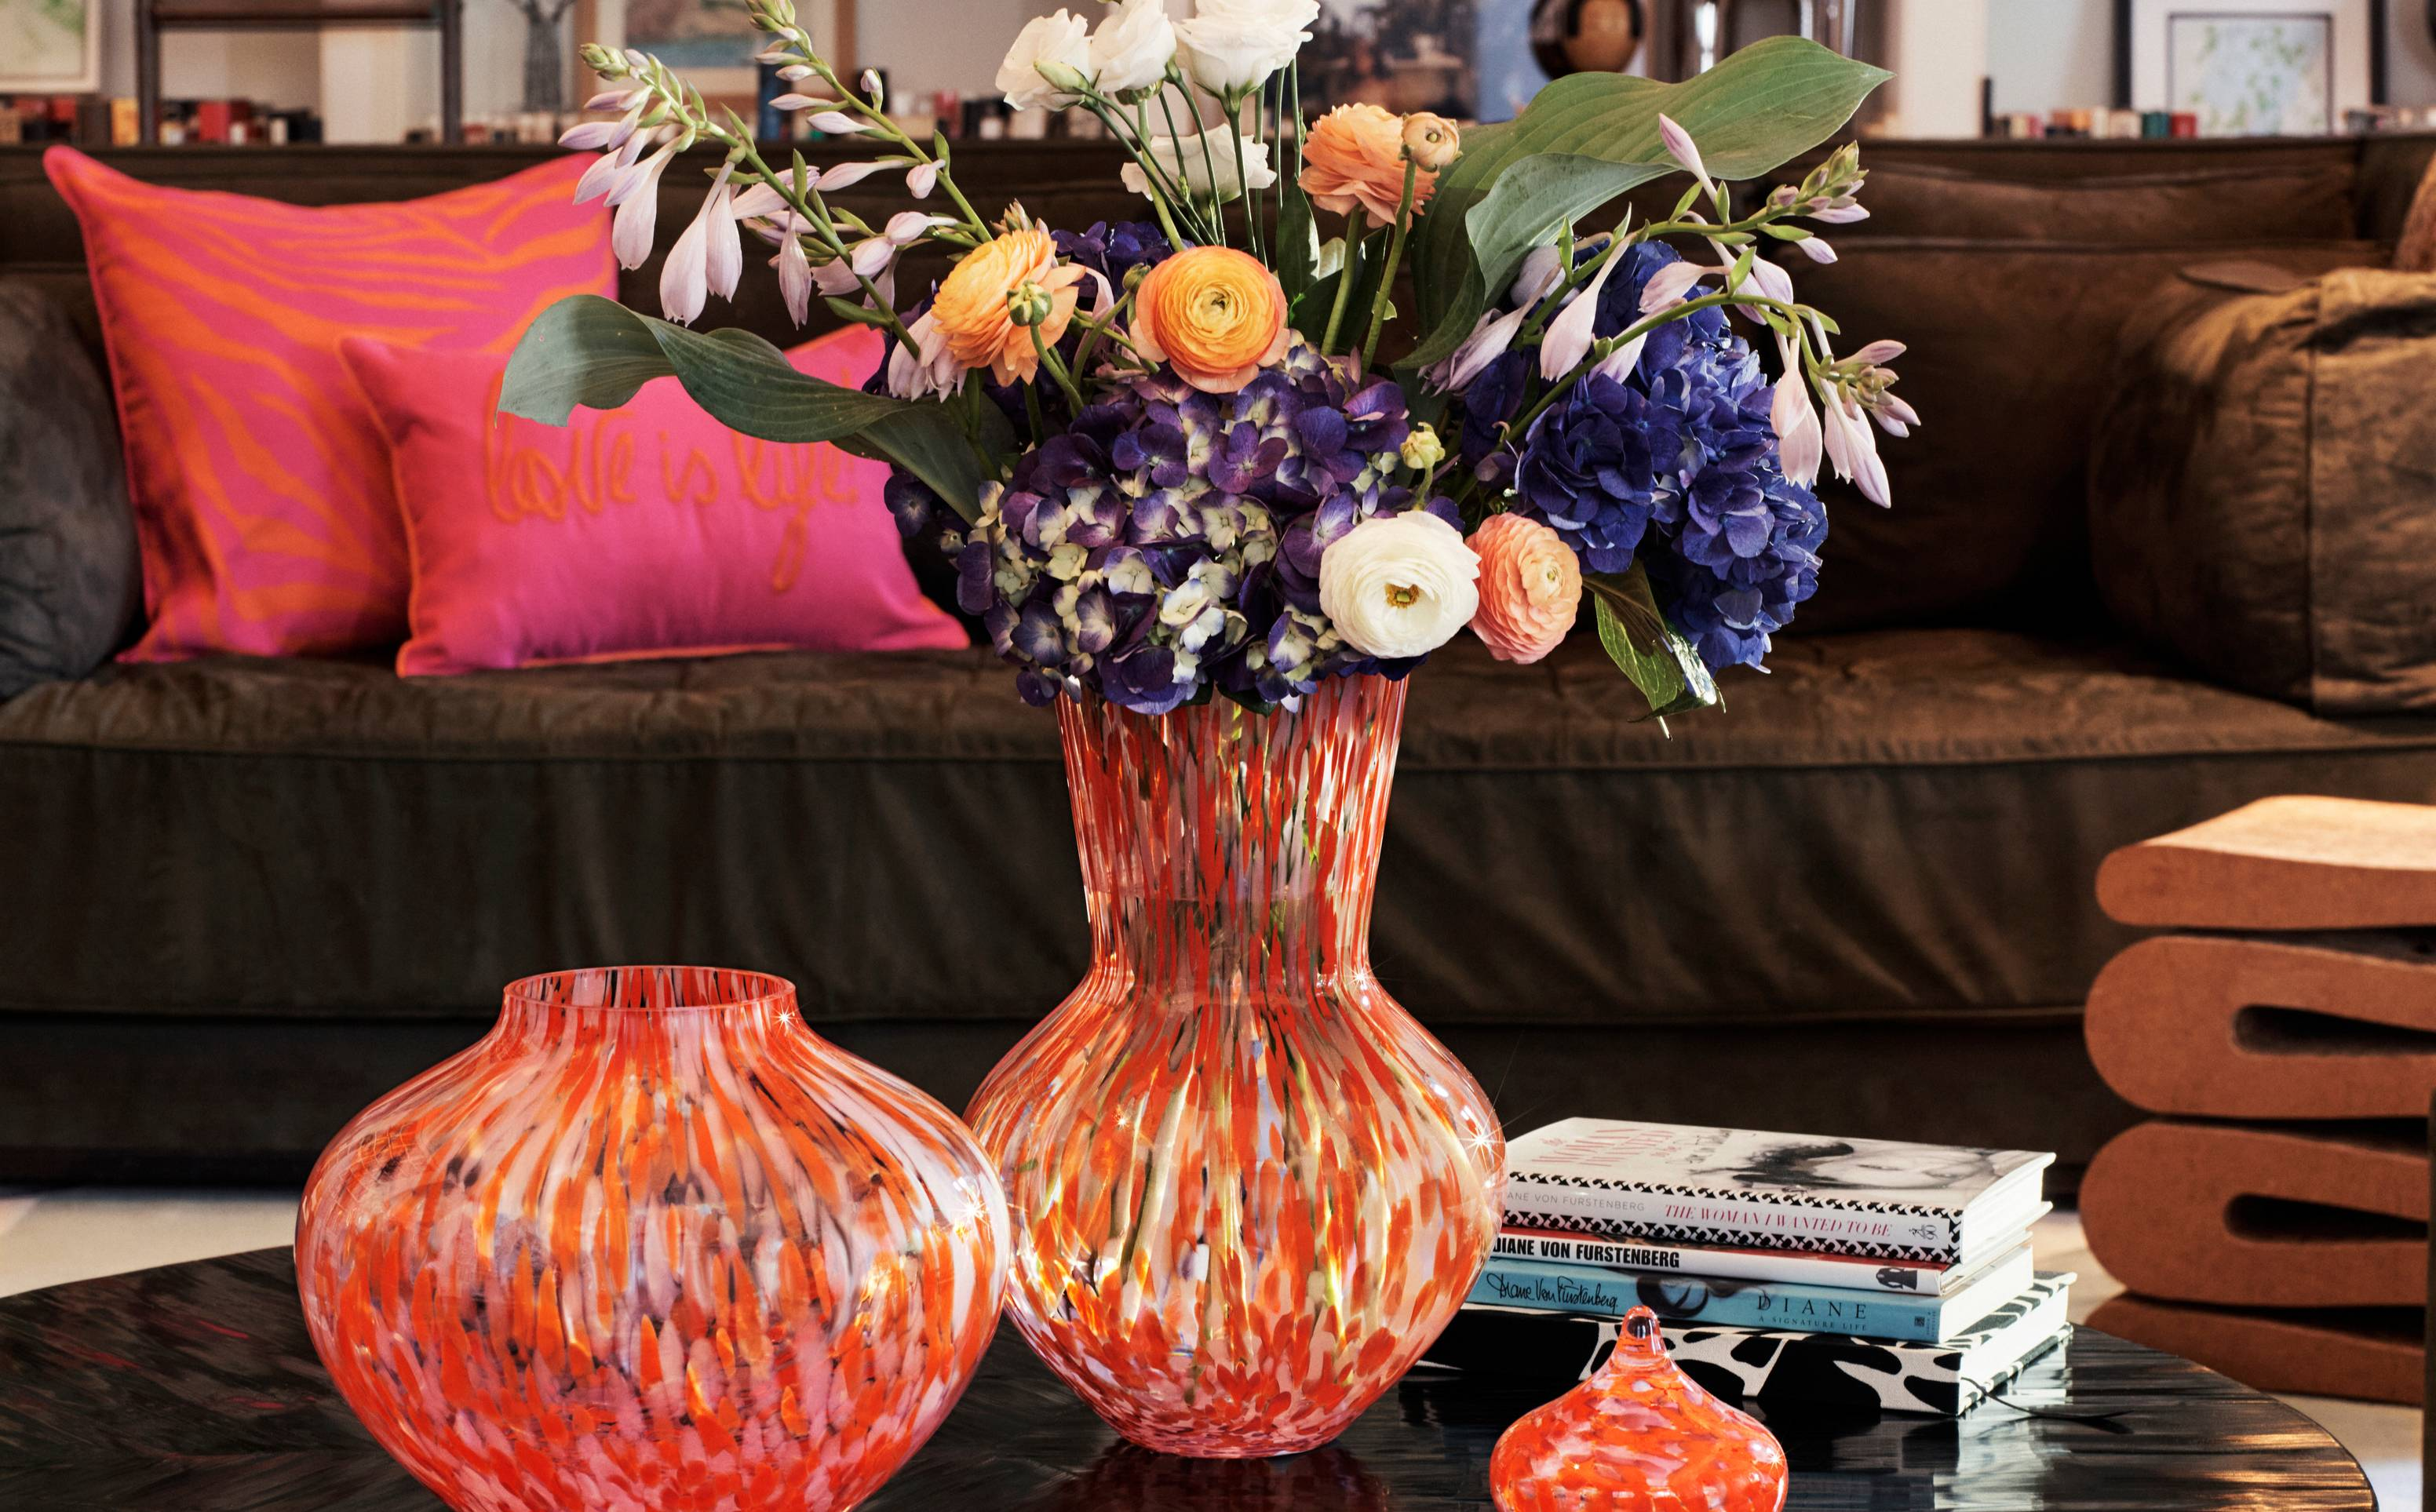 Diane von Furstenberg's interior collection for H&M Home launches